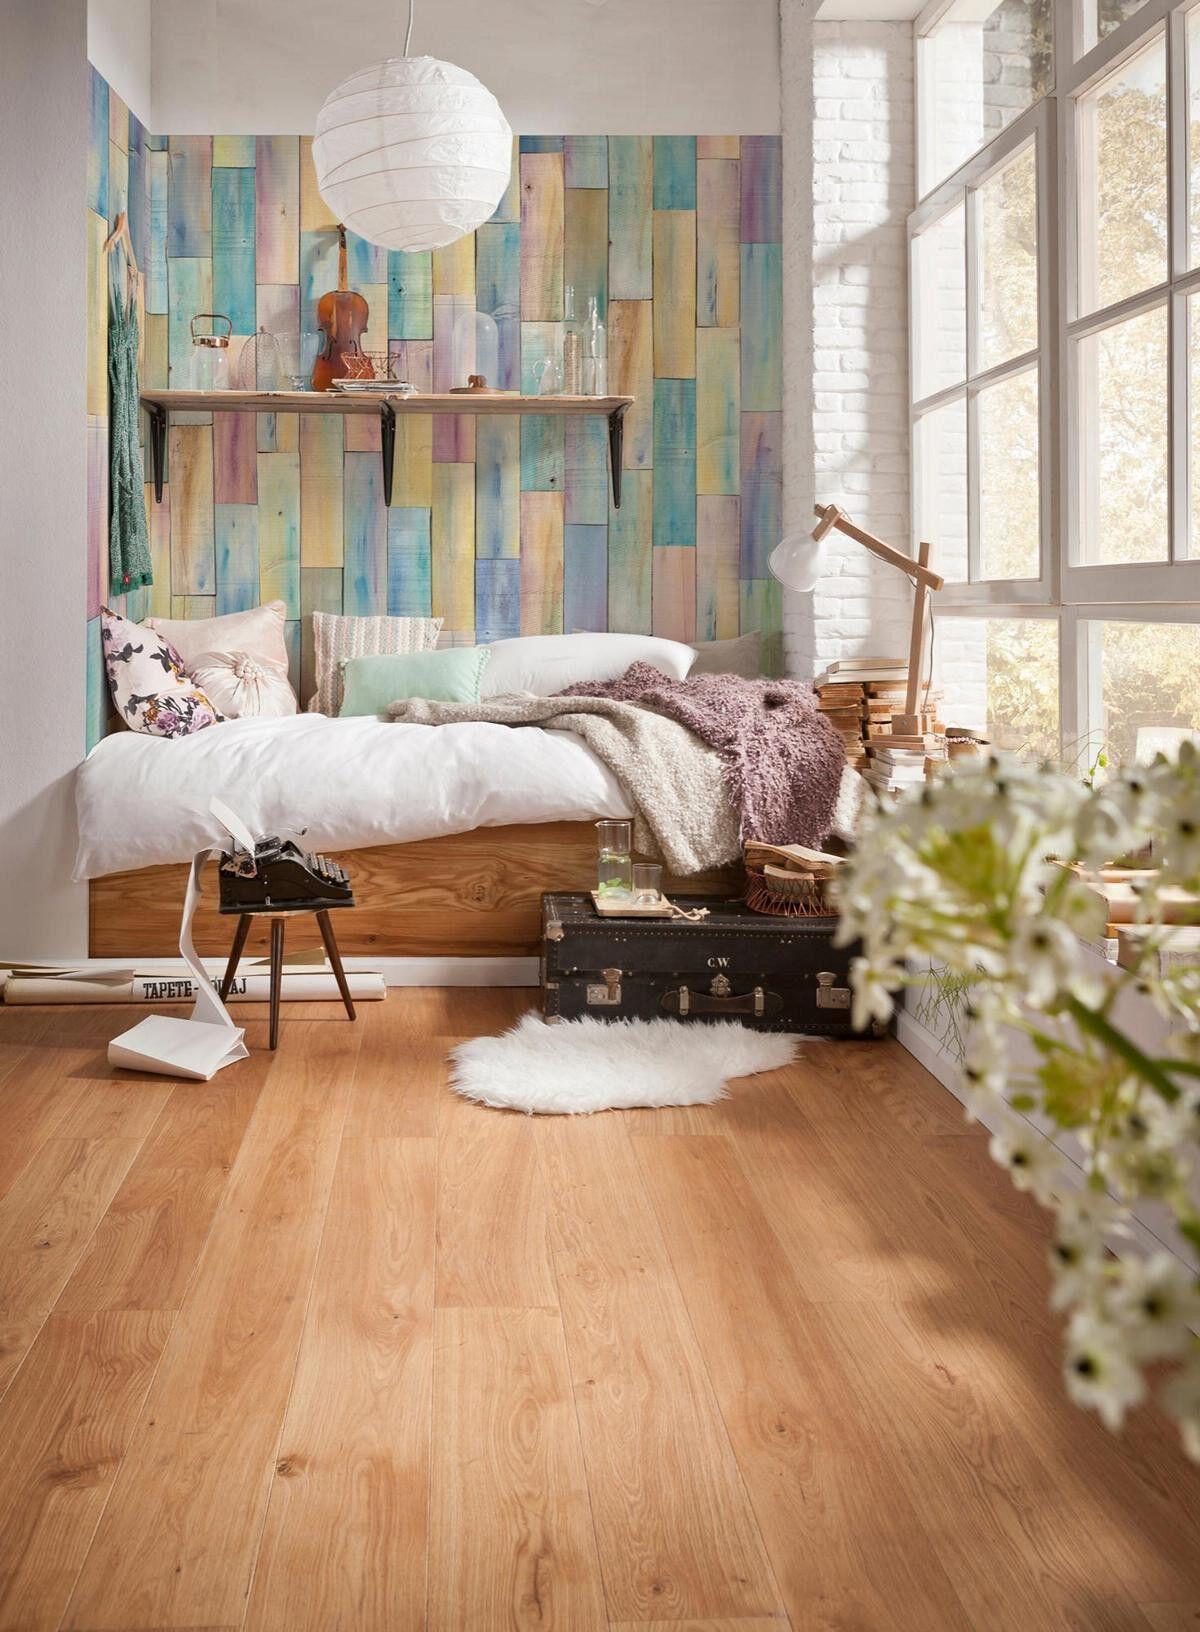 tapete in holzoptik cool tapete holzoptik grau die neuesten with tapete in holzoptik trendy. Black Bedroom Furniture Sets. Home Design Ideas